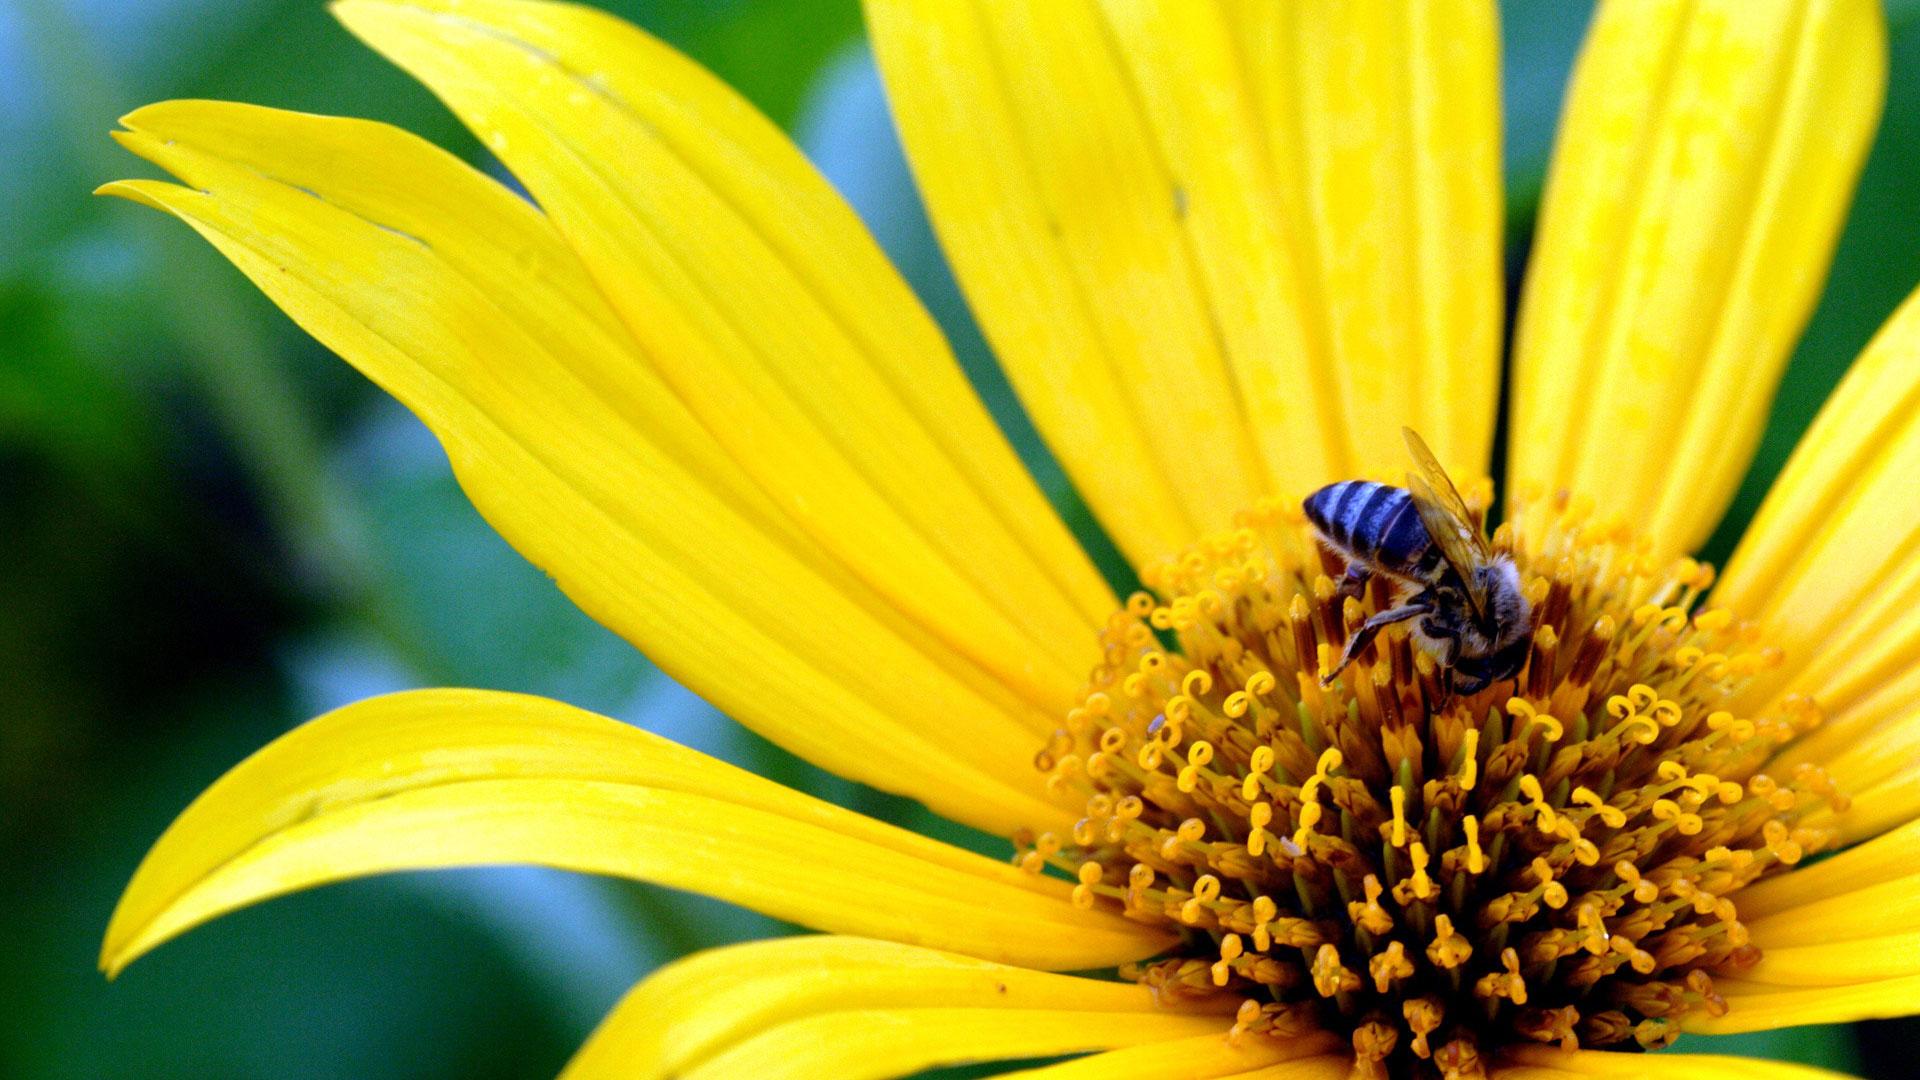 Yellow Flower - Big Size Yellow Flower , HD Wallpaper & Backgrounds